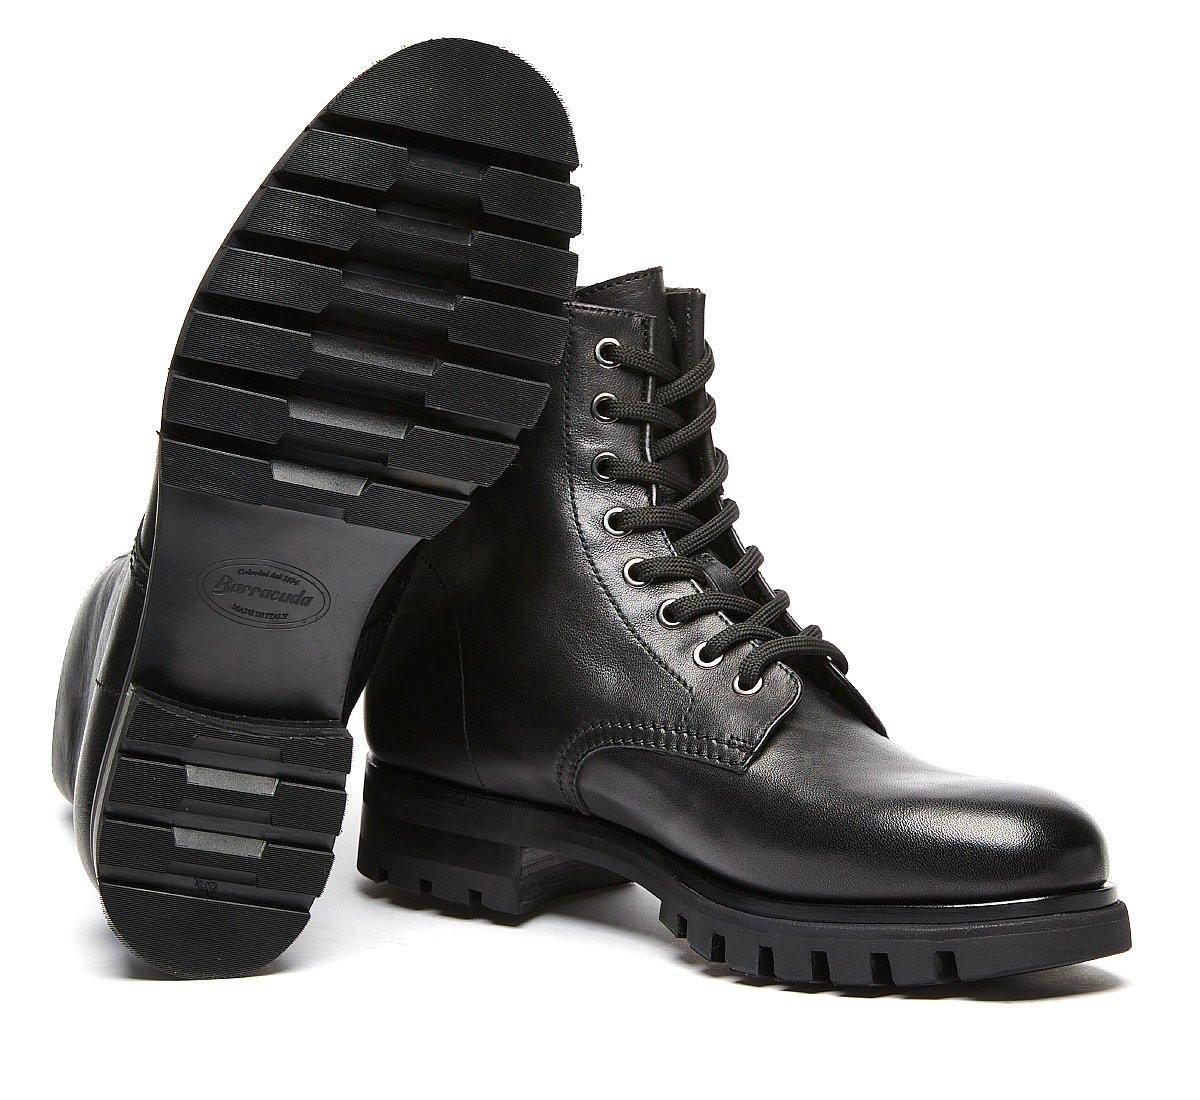 Barracuda commando boot in luxury calf leather